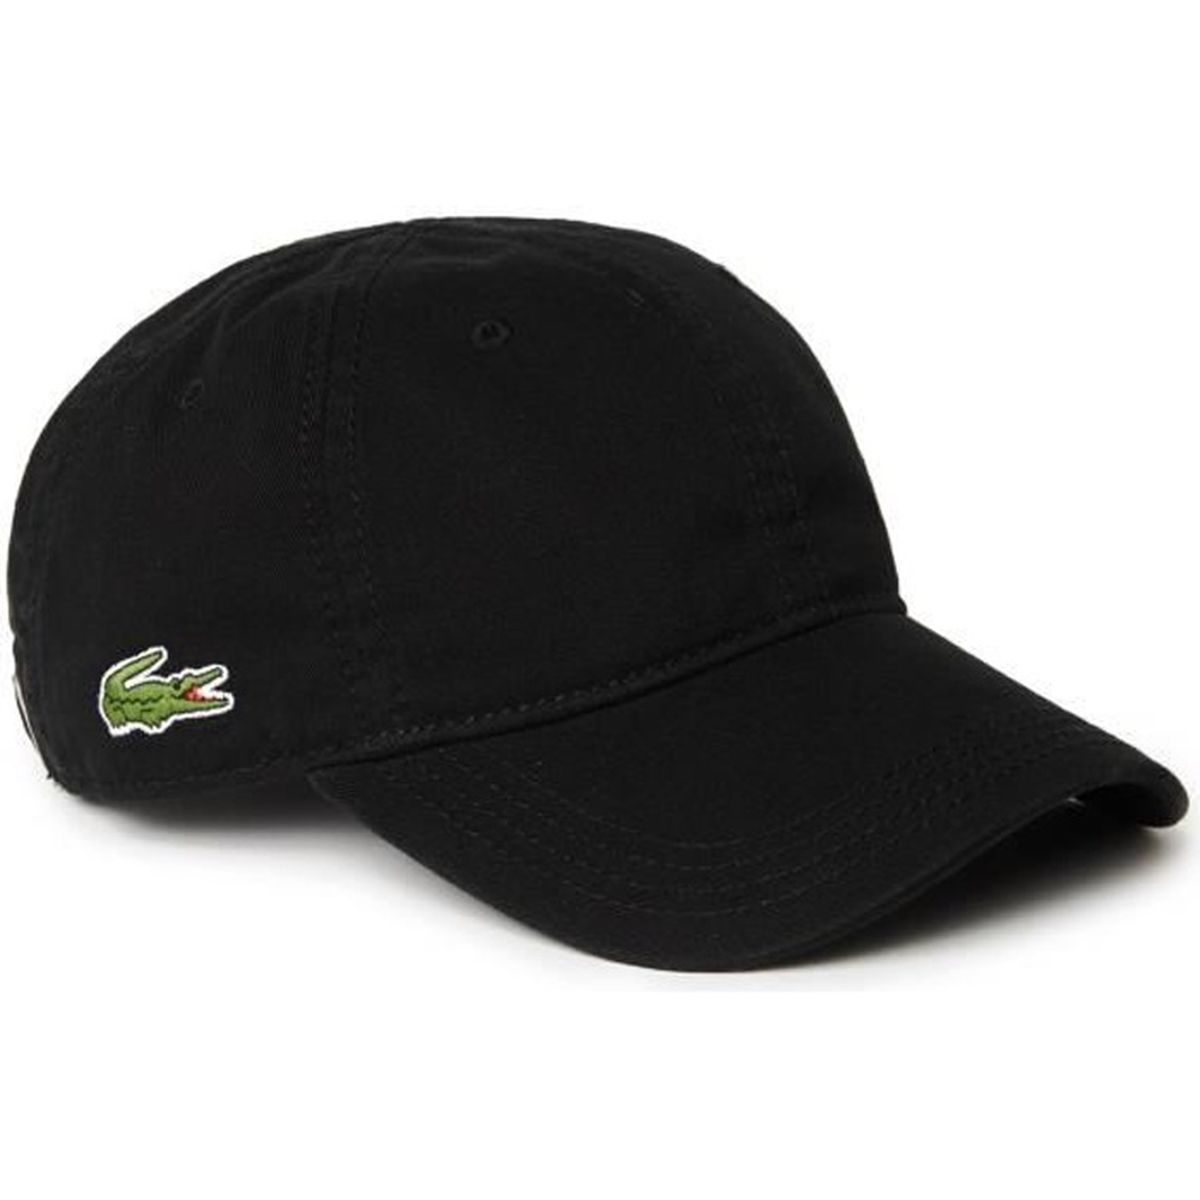 lacoste homme casquette baseball noire small croco rk9811 achat vente casquette. Black Bedroom Furniture Sets. Home Design Ideas